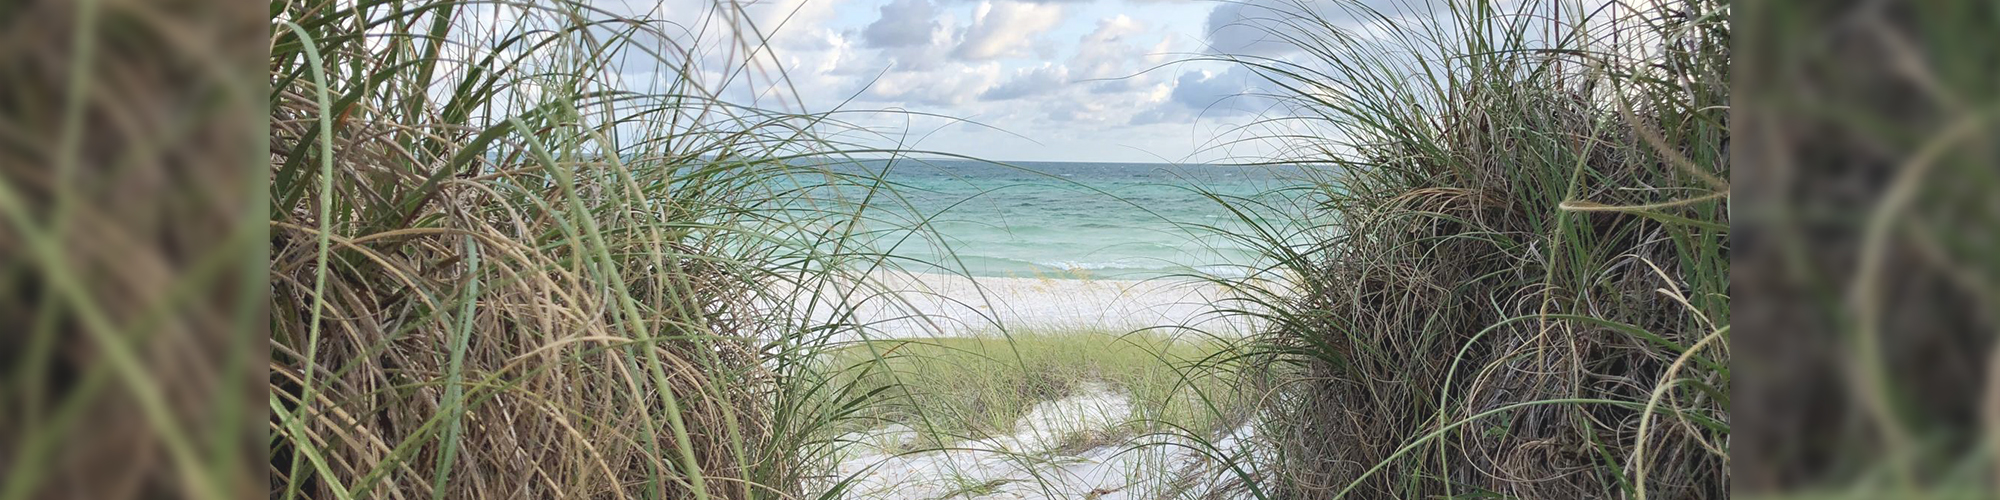 Smaller Beach banner image